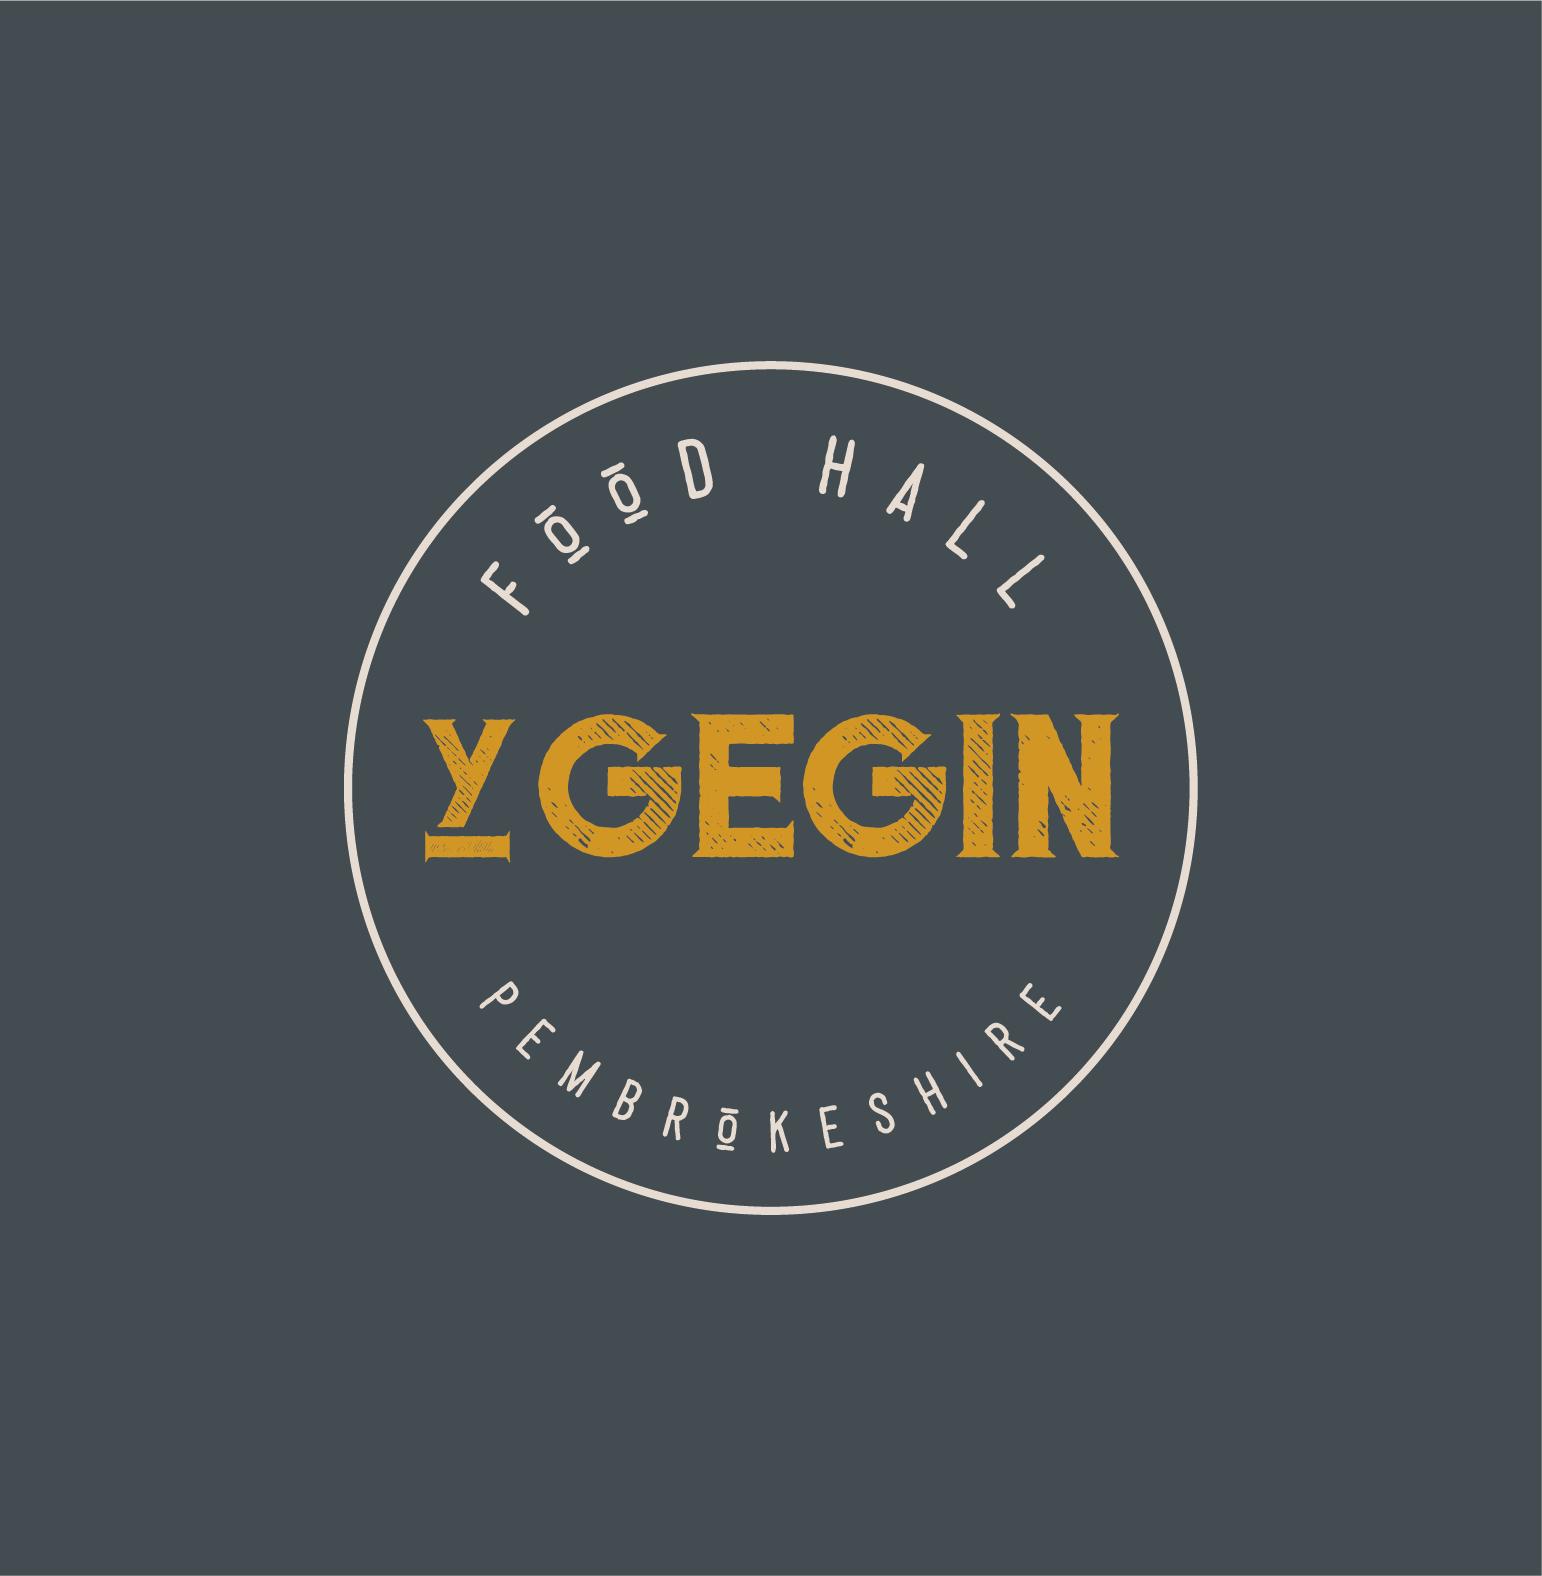 Y Gegin Logos V4_Artboard 5.png